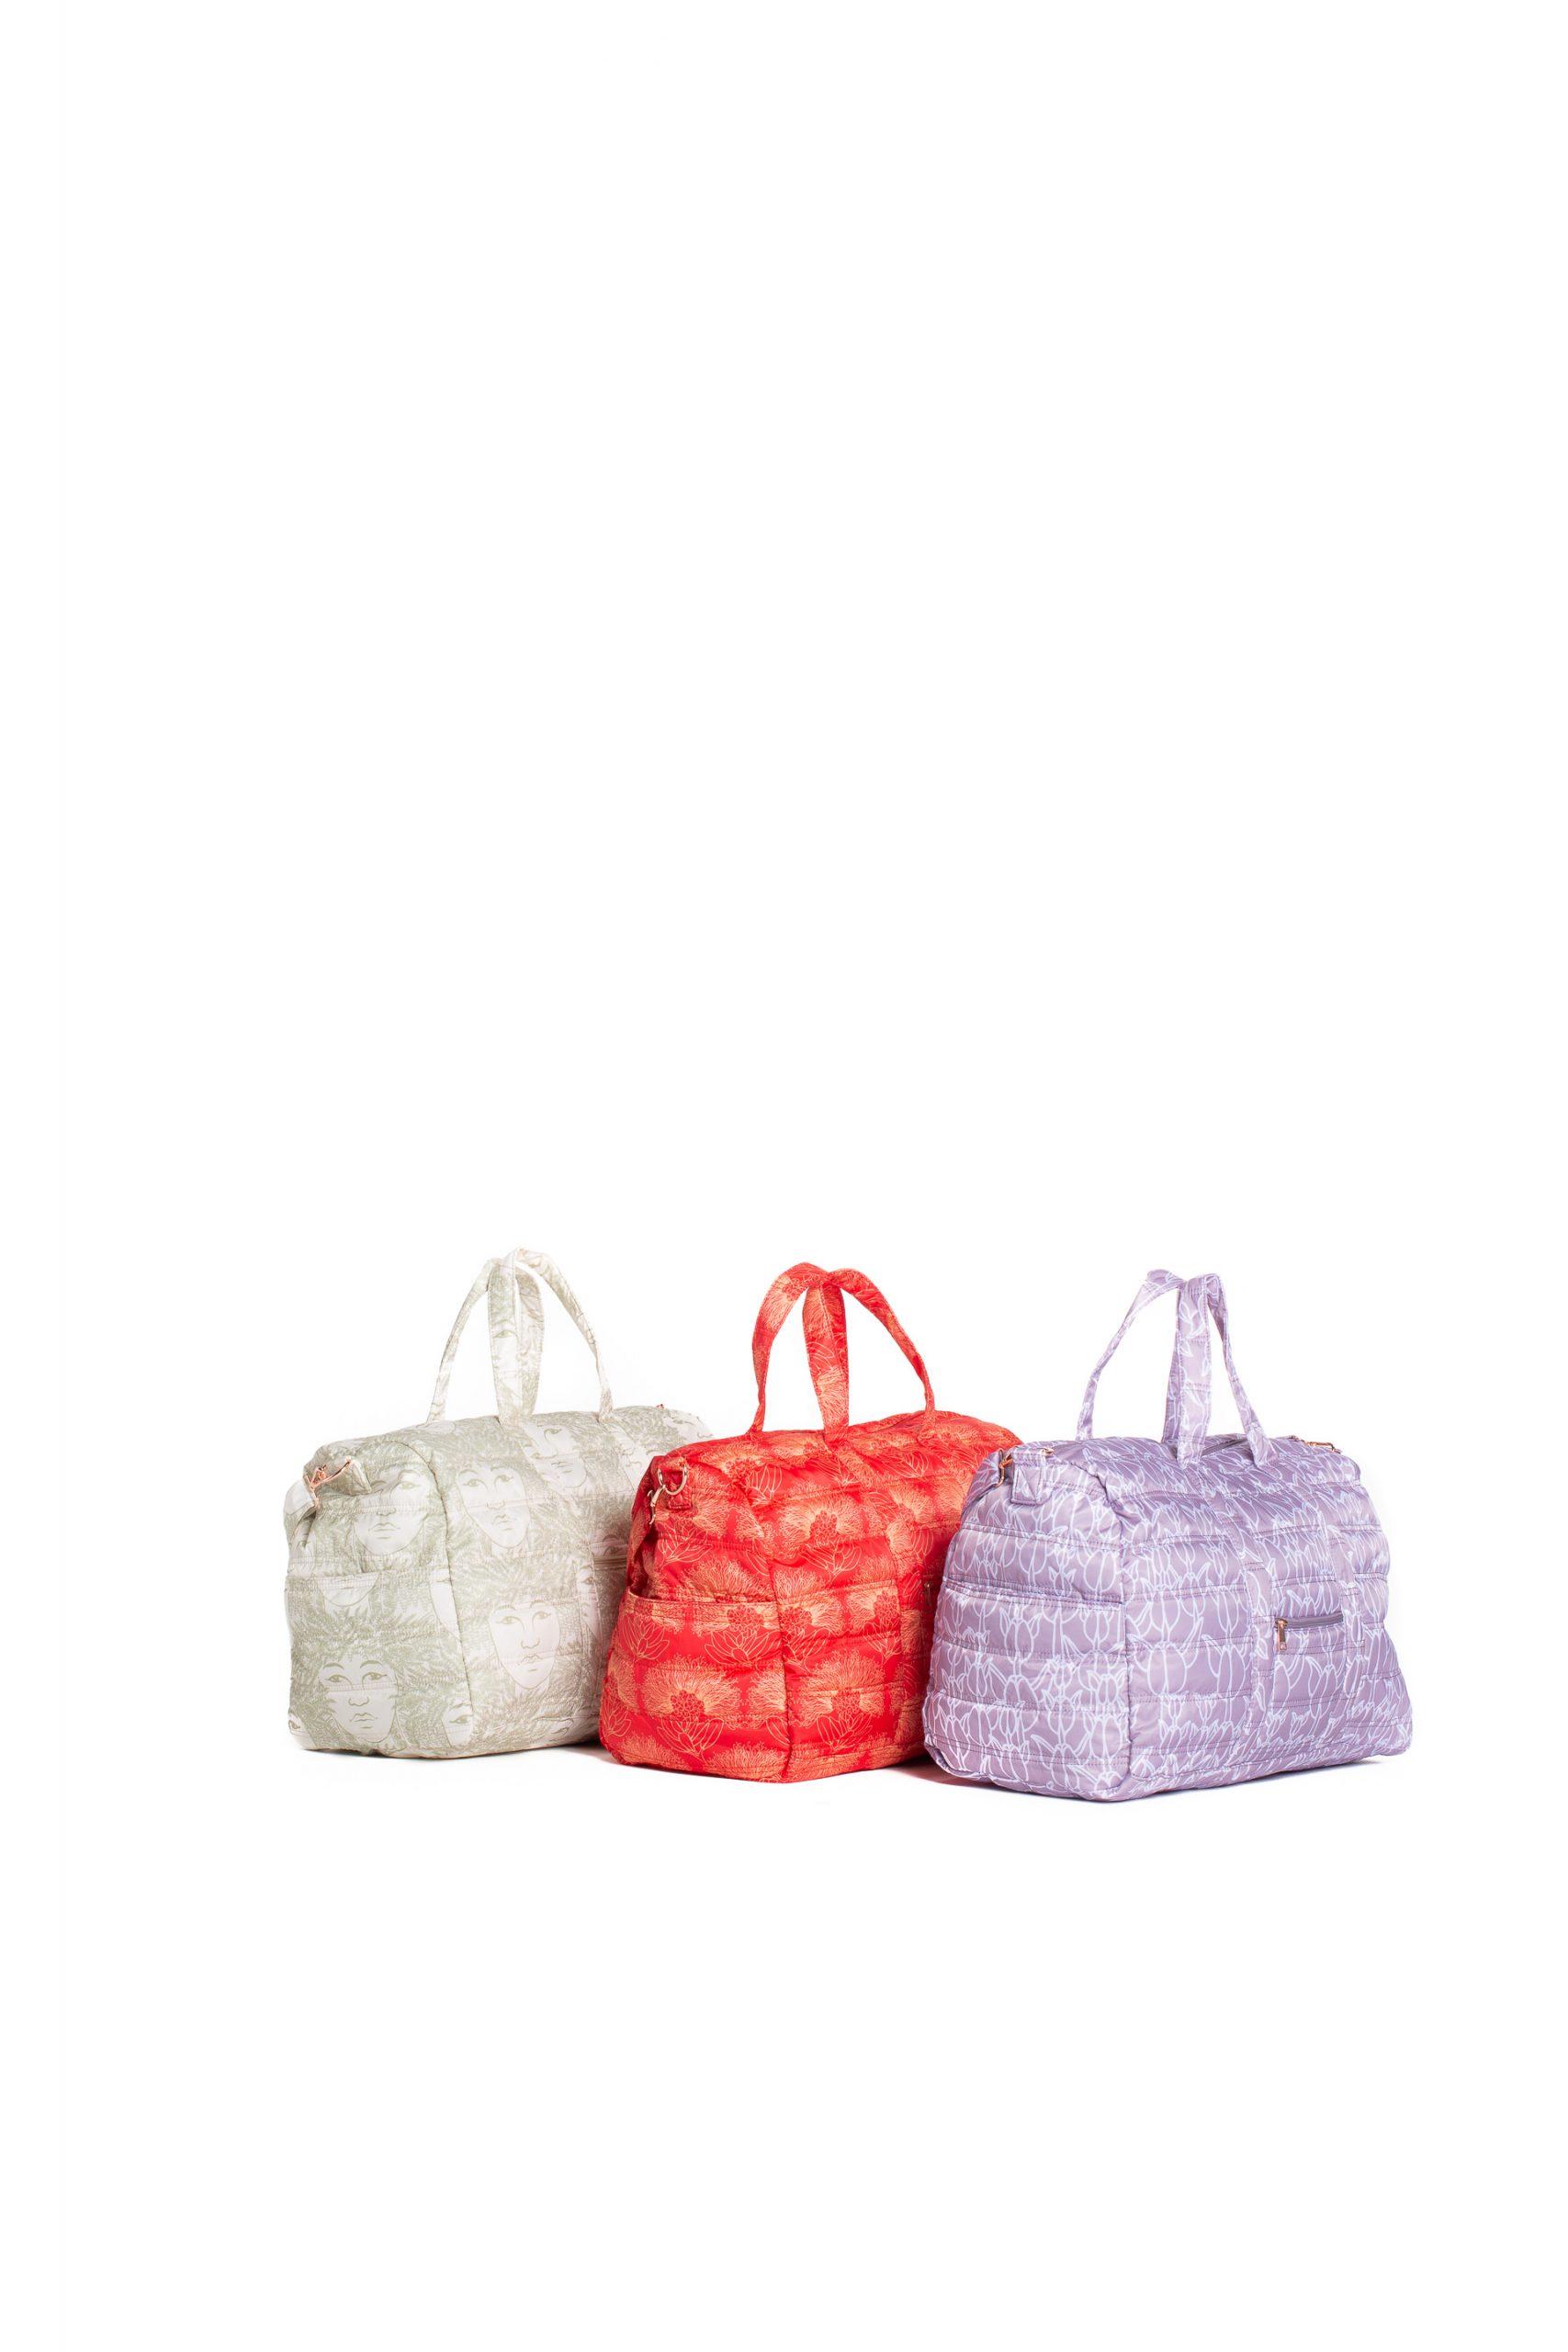 Laulea Bag Trio in Red, Green, and Purple